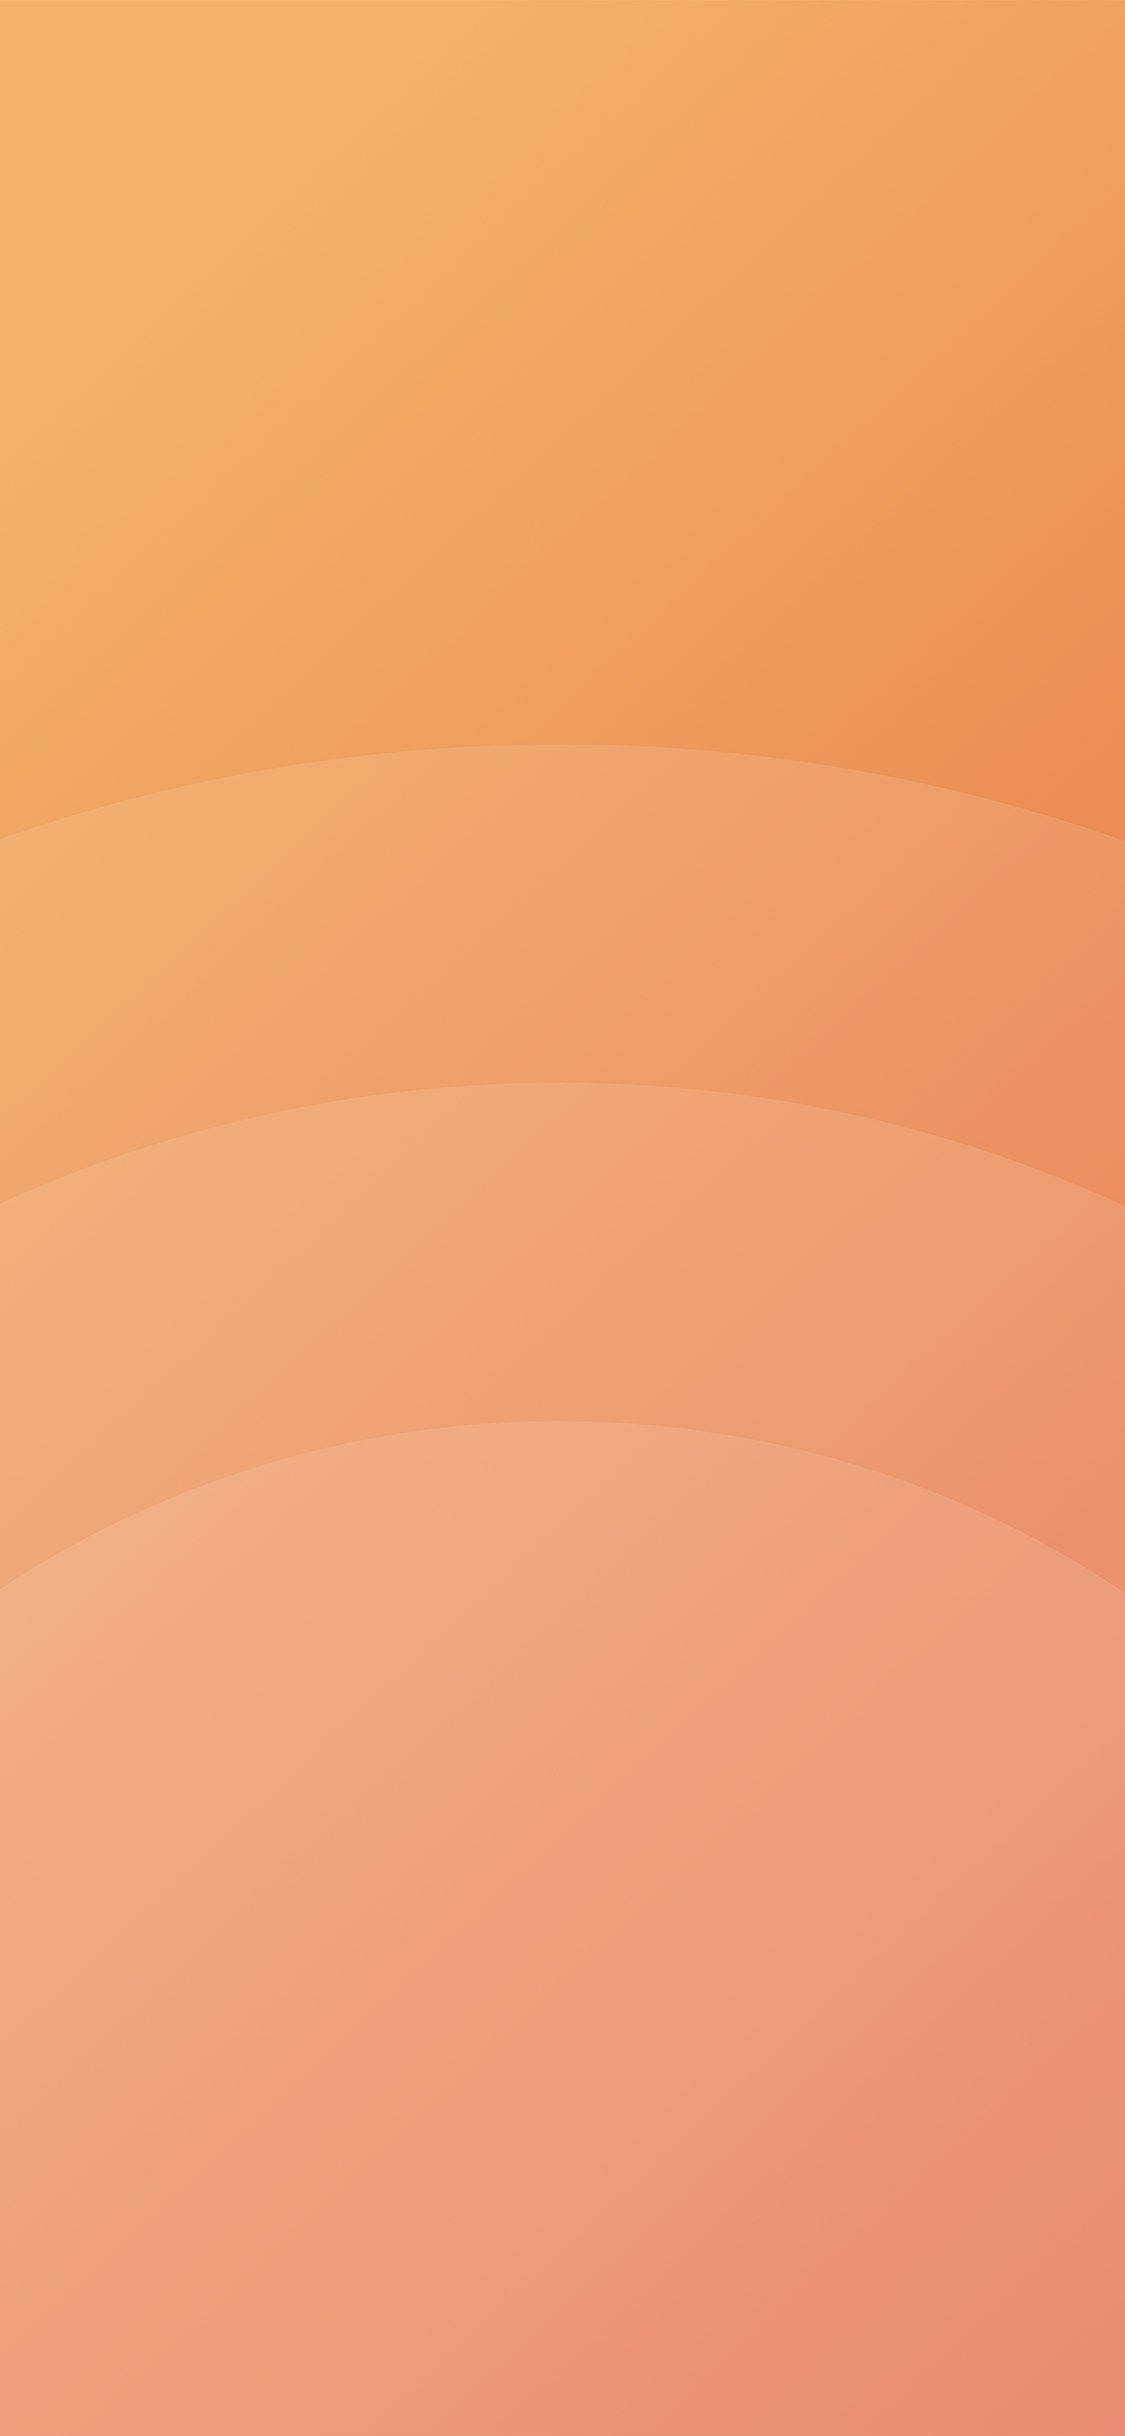 Circle orange simple minimal pattern background iphone x wallpaper ilikewallpaper com